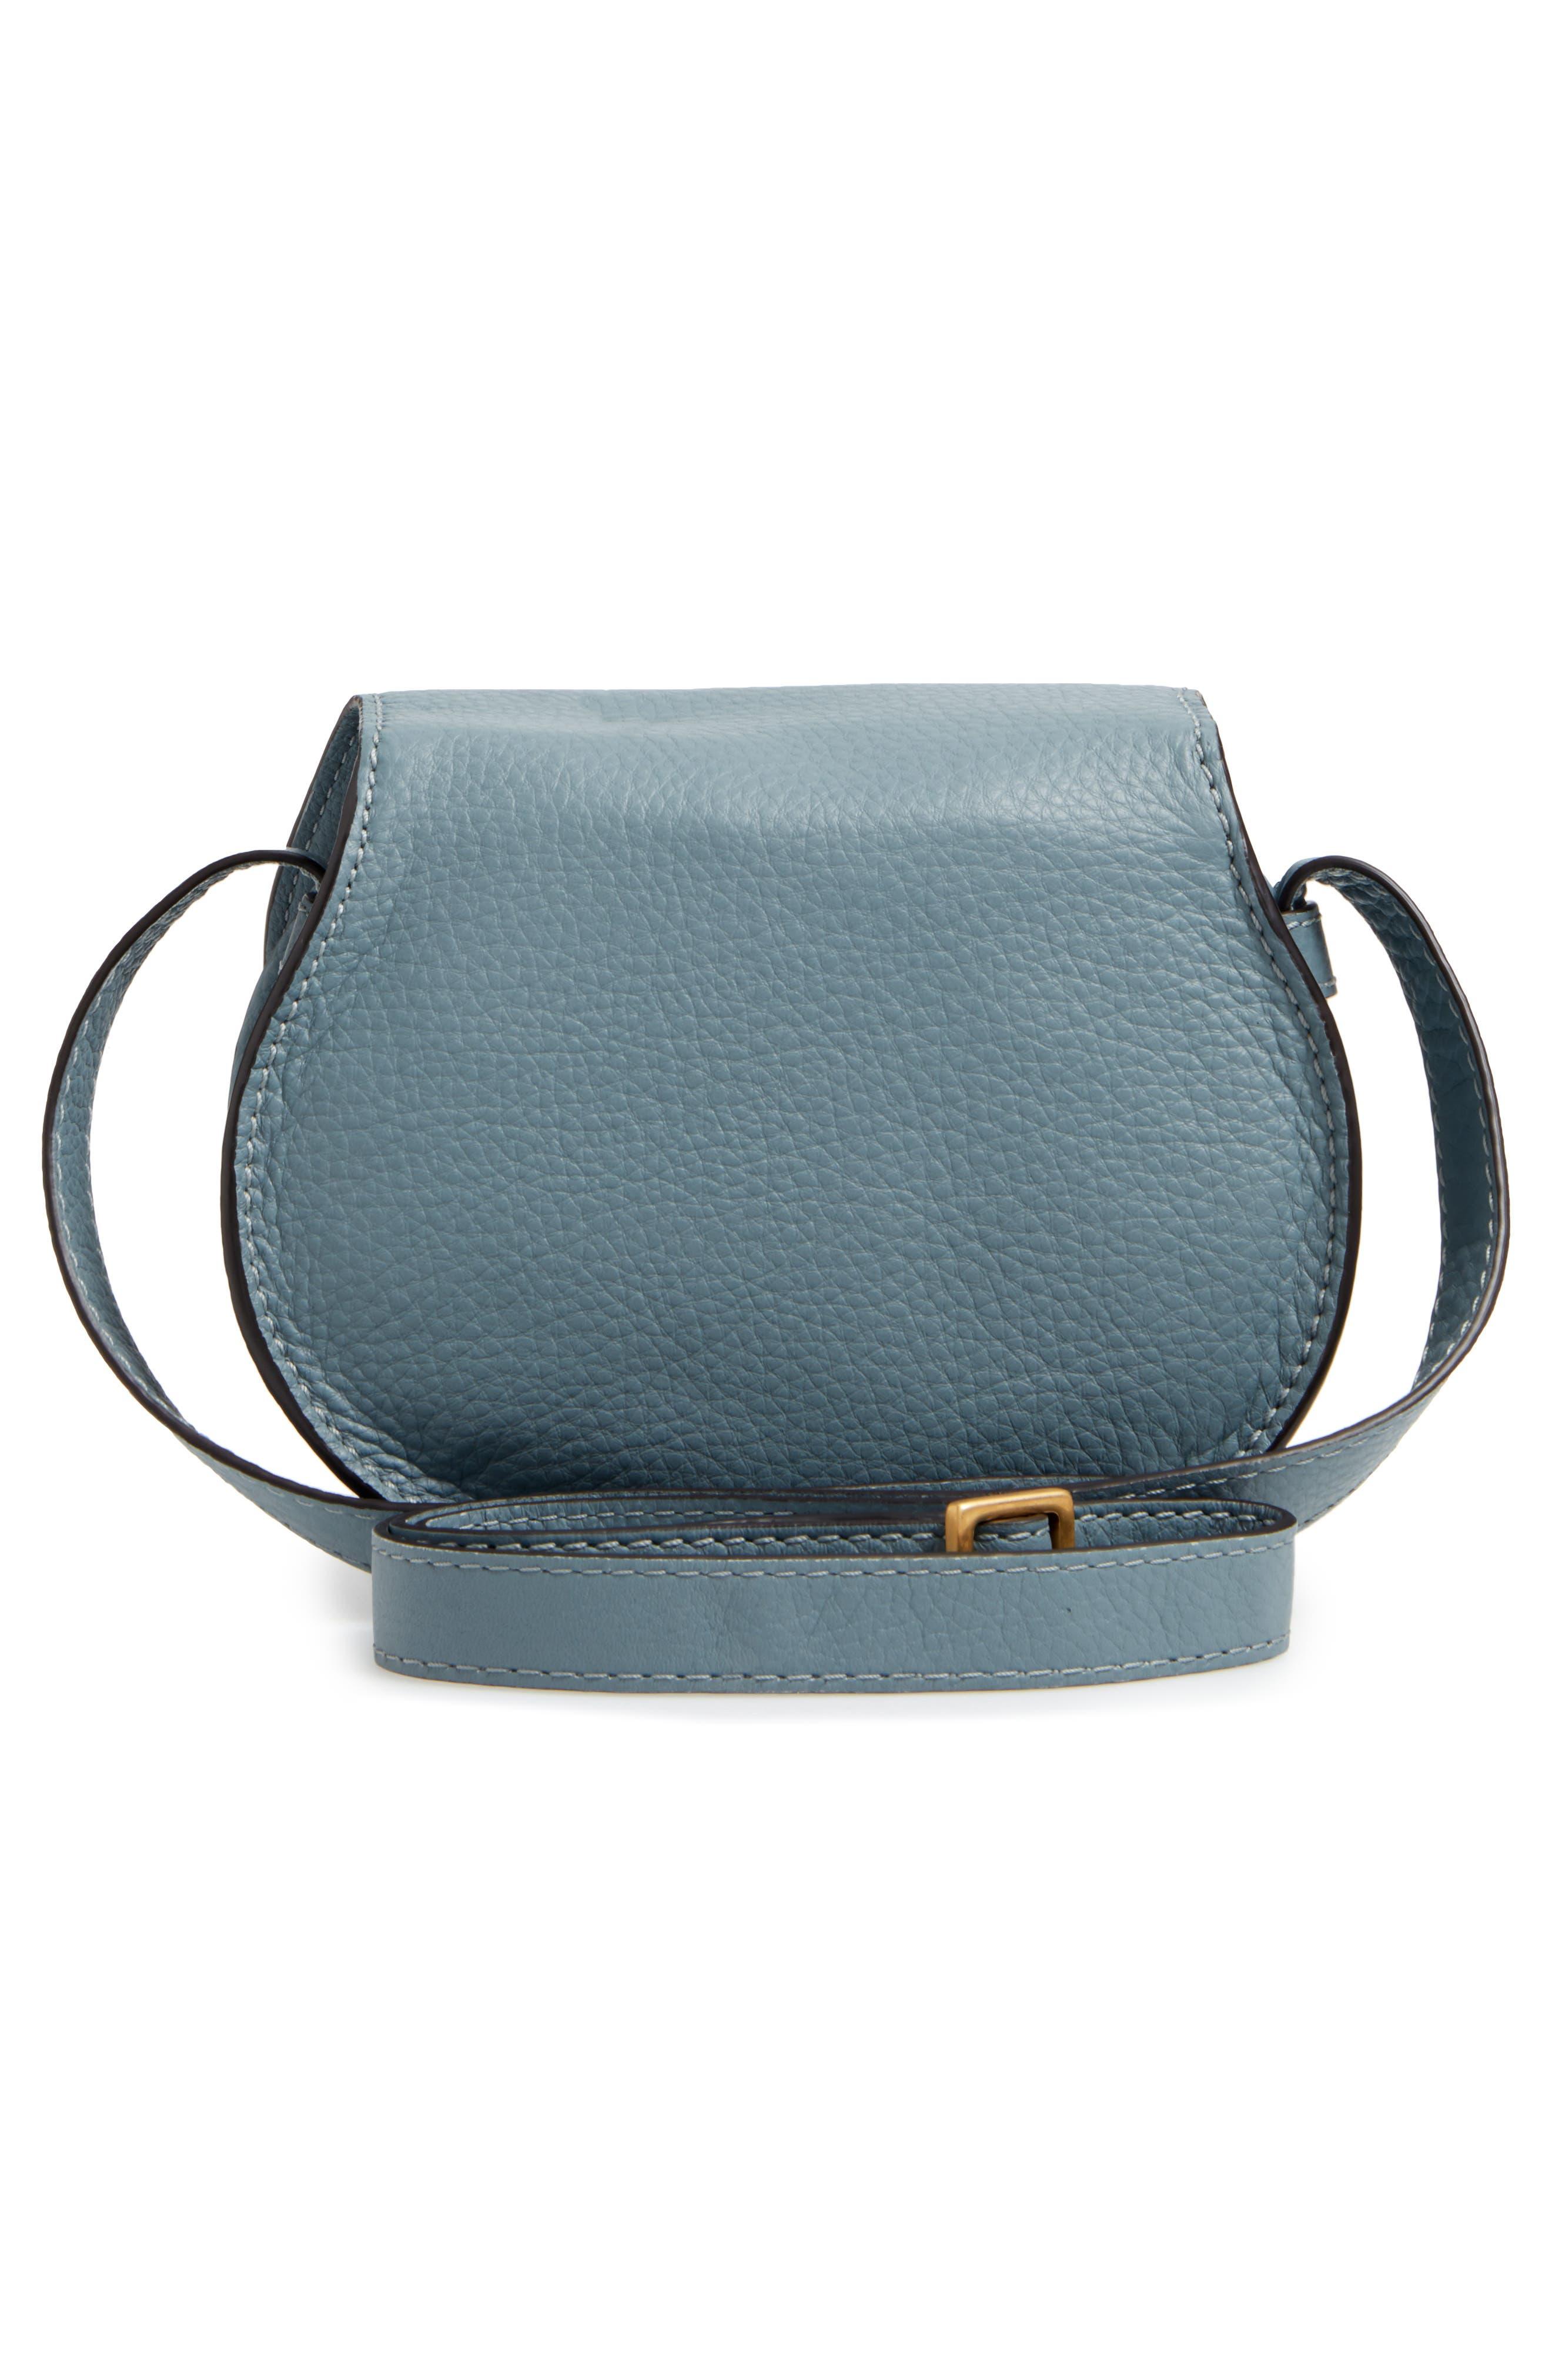 'Mini Marcie' Leather Crossbody Bag,                             Alternate thumbnail 3, color,                             BFC CLOUDY BLUE